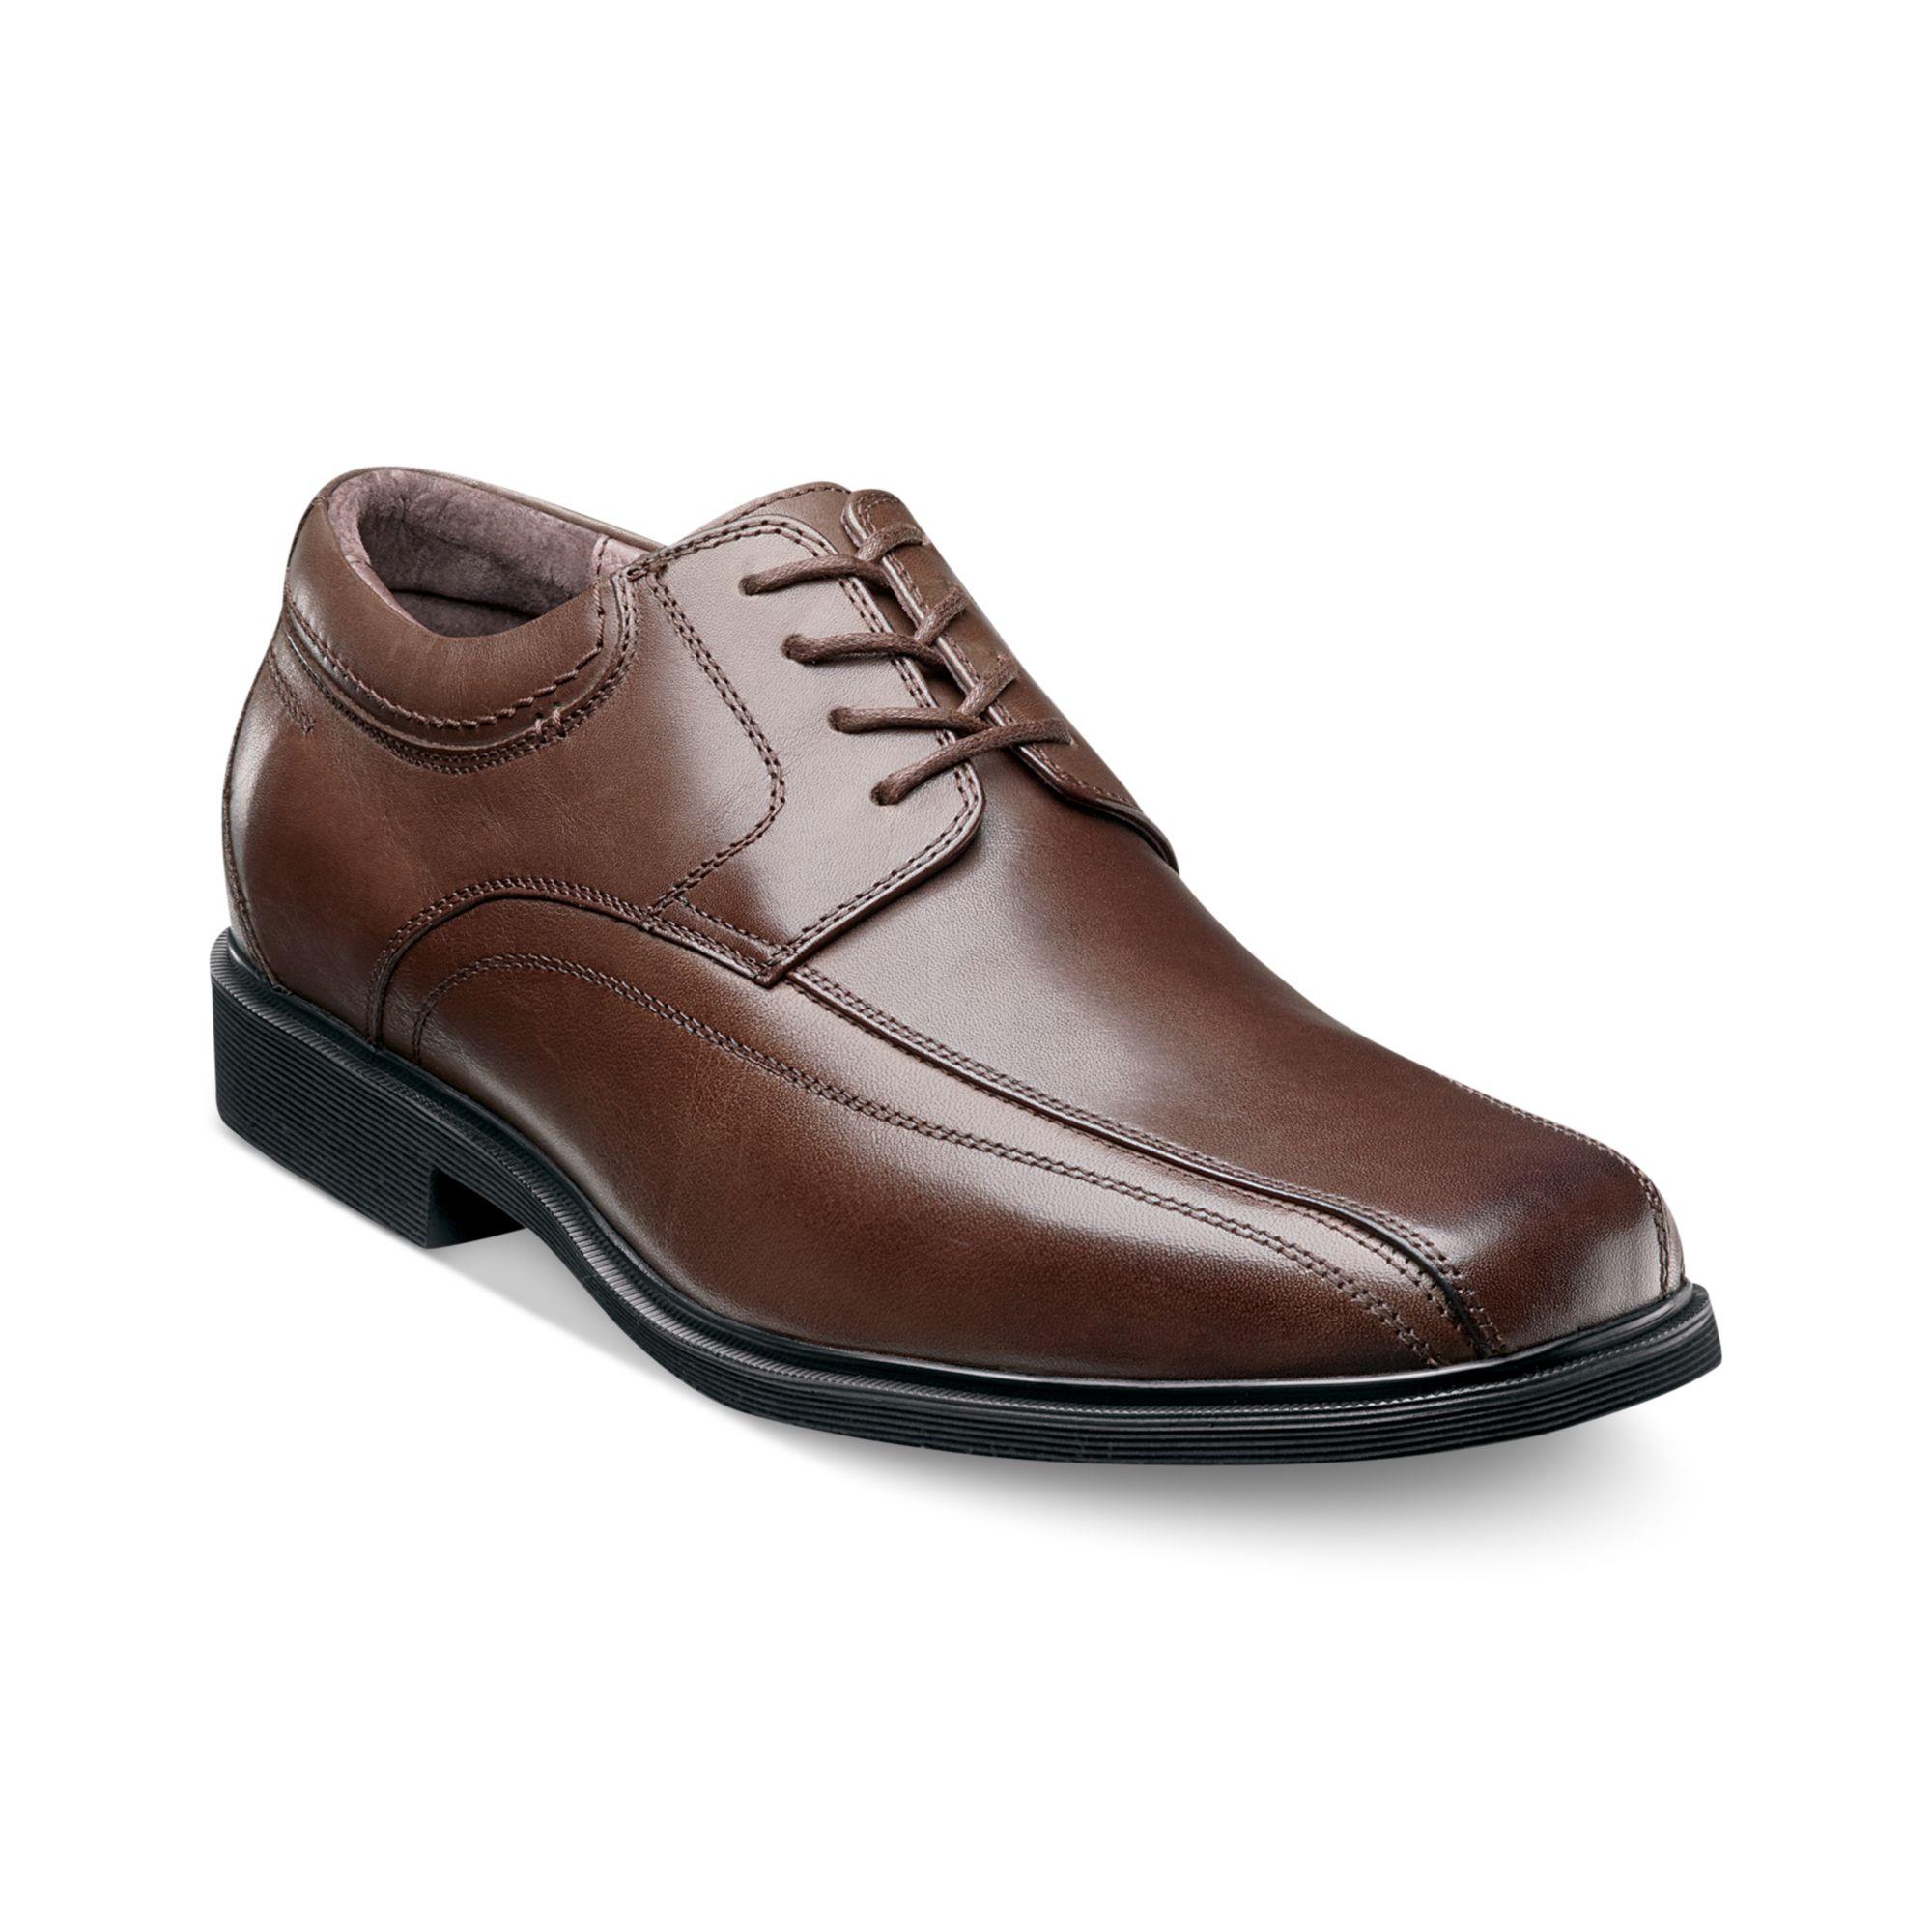 Macy S Mens Shoes In Brown Florsheim